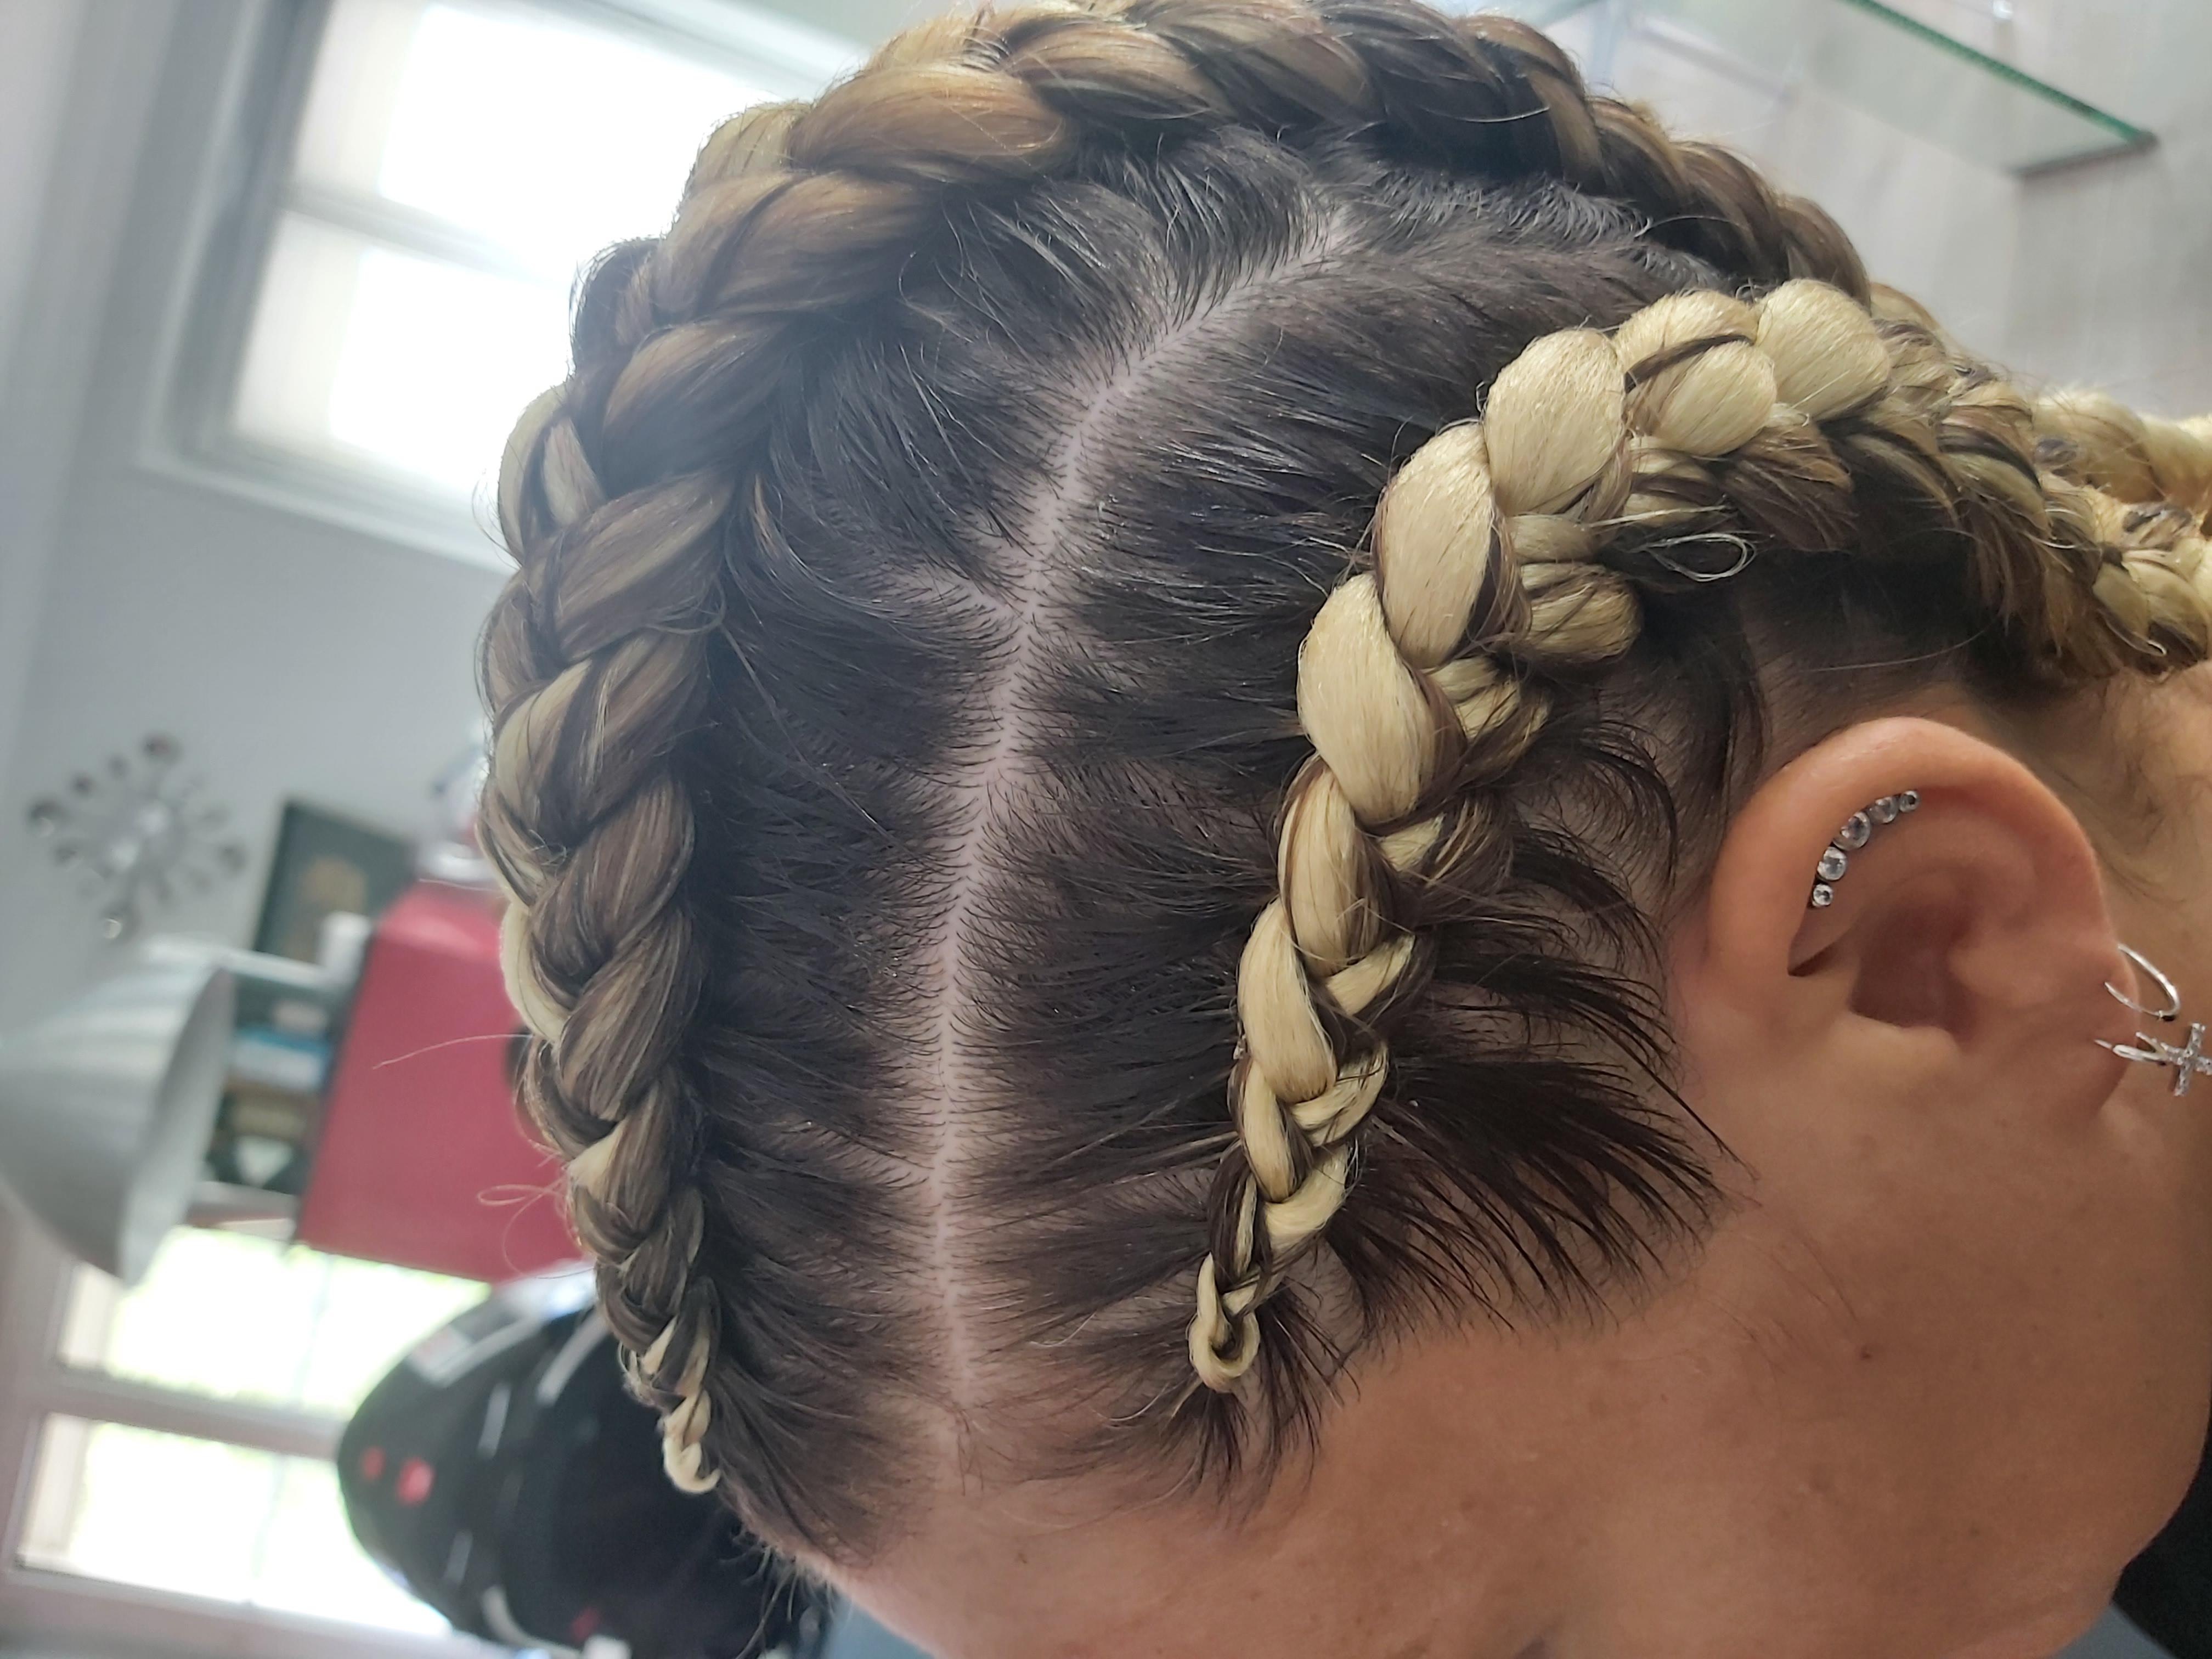 salon de coiffure afro tresse tresses box braids crochet braids vanilles tissages paris 75 77 78 91 92 93 94 95 IRTJDJRP